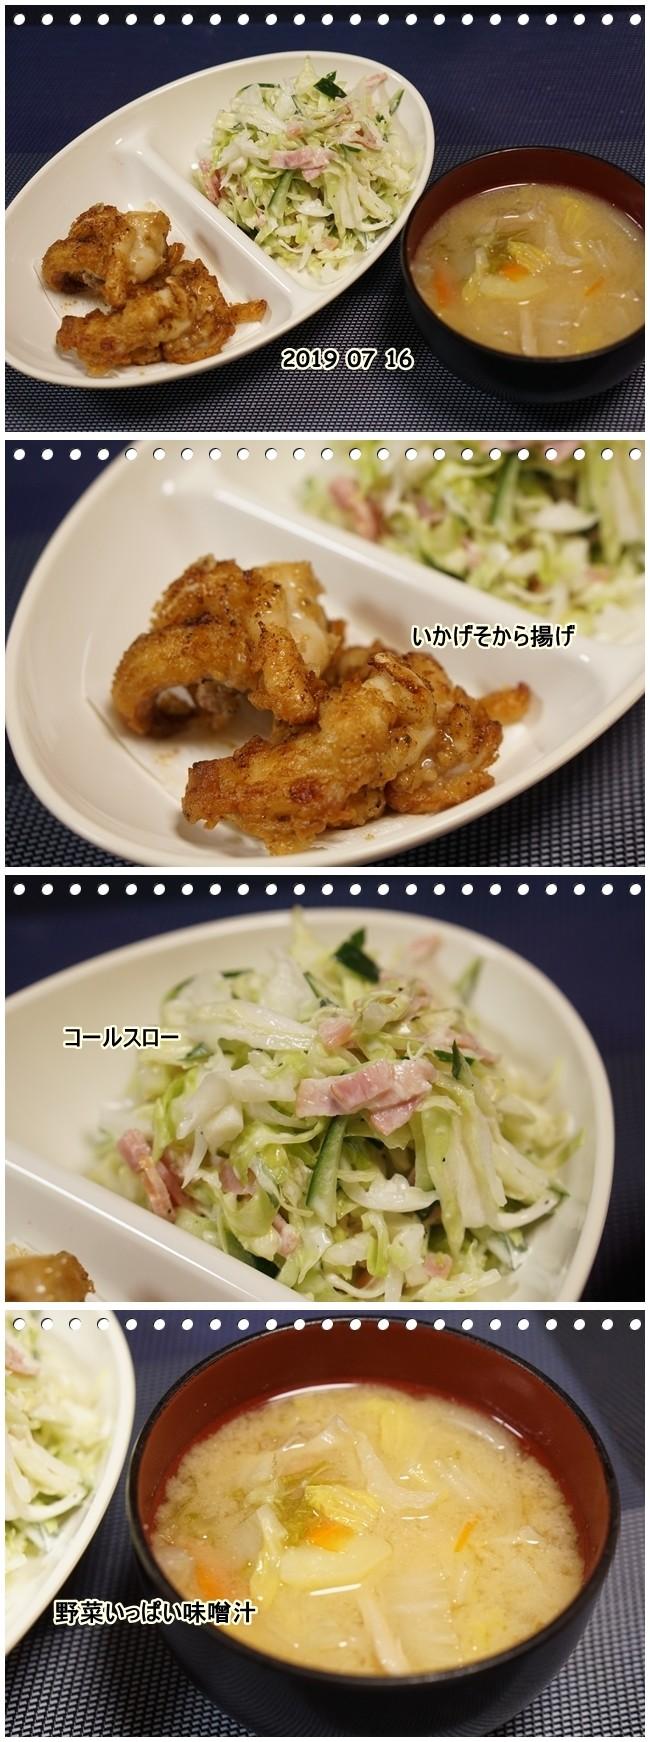 ■DSC03821-vert